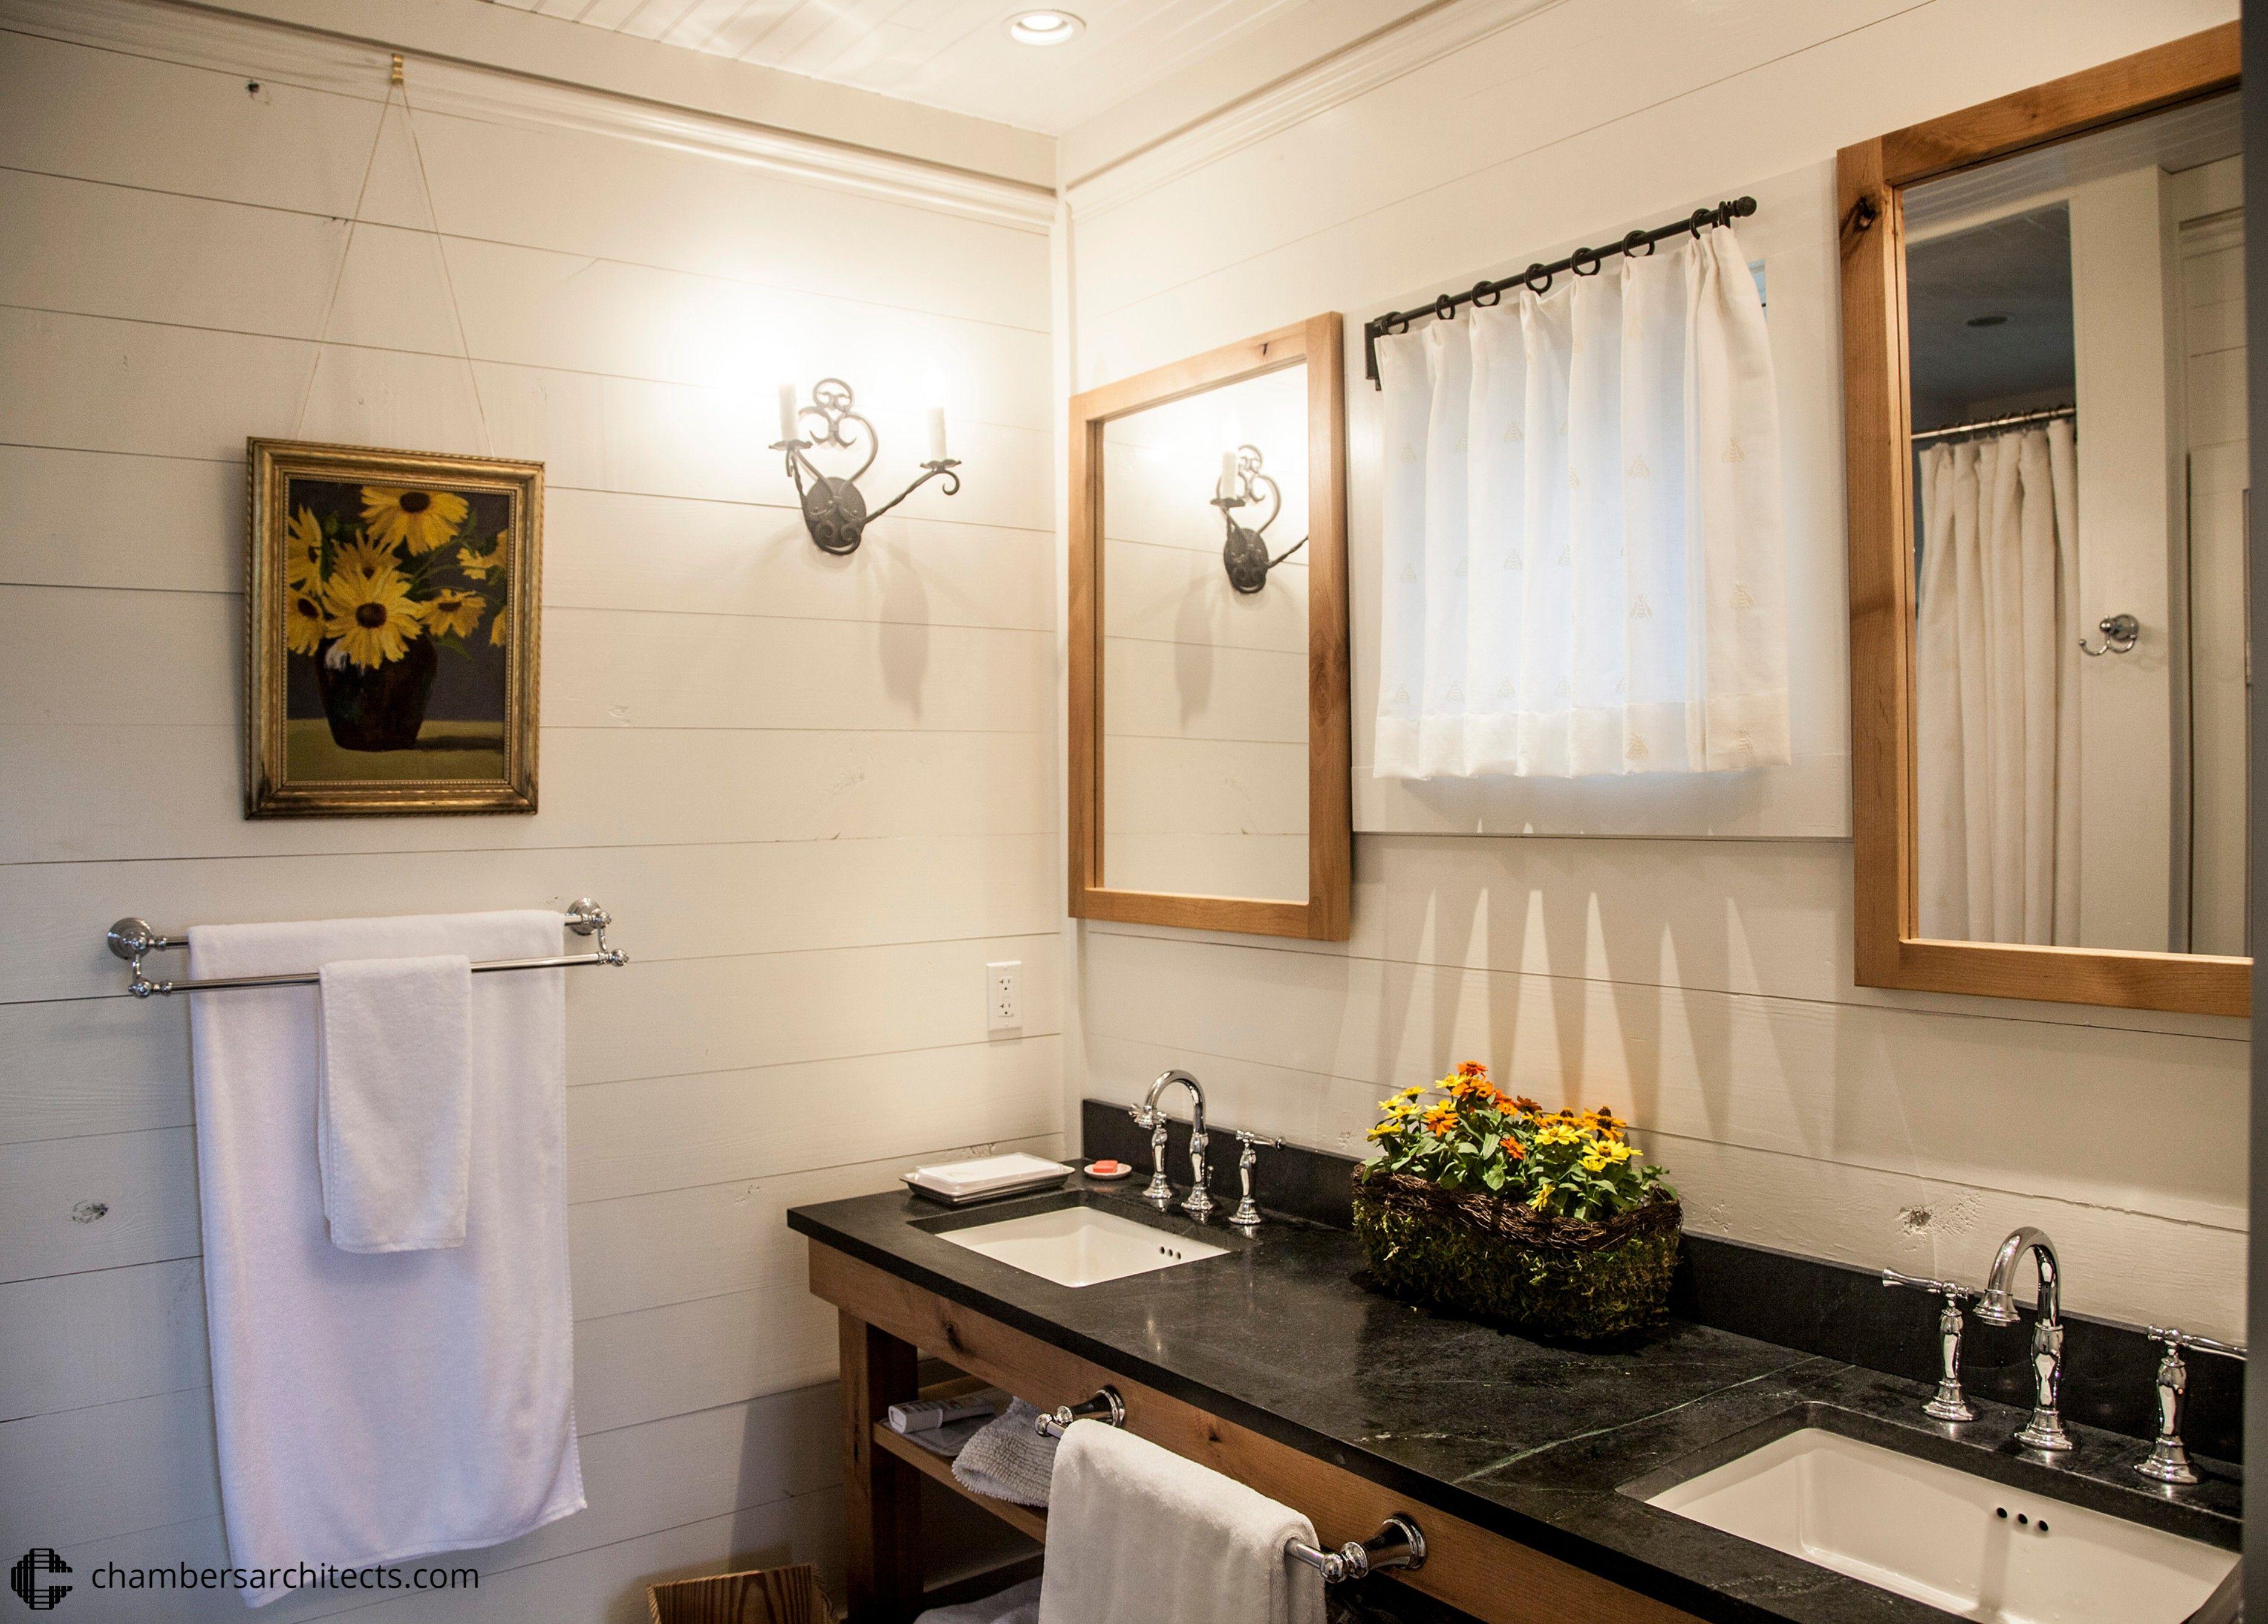 Pleasant Bathroom On A Historic Bosque County Texas Farm Ranch Download Free Architecture Designs Scobabritishbridgeorg